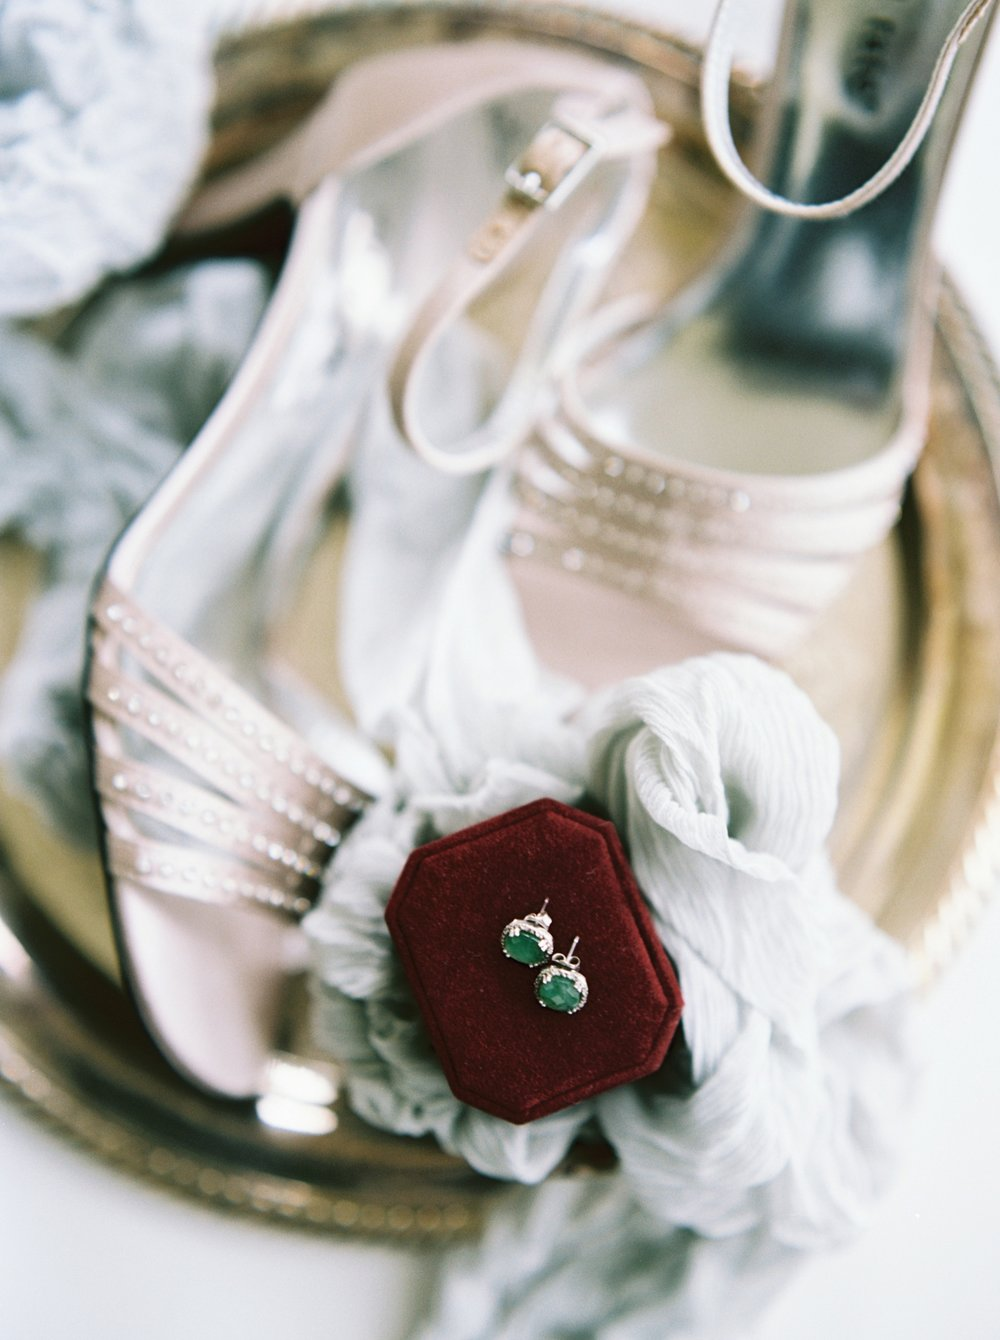 season magnolia manor wedding elisa ignacio czar goss photo 4.jpg